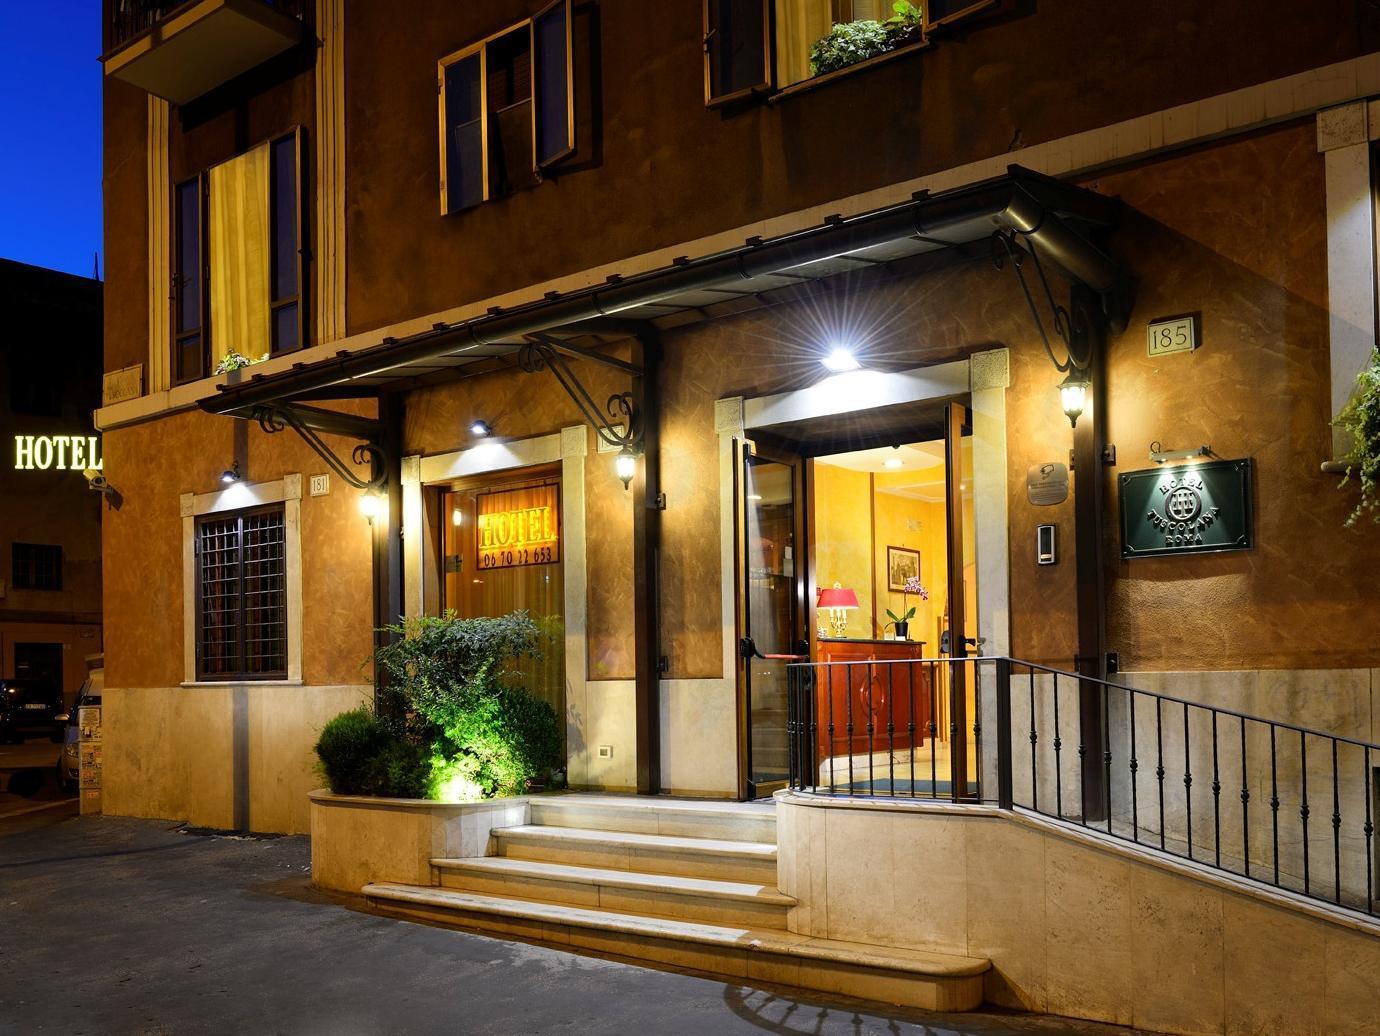 Hotel Tuscolana